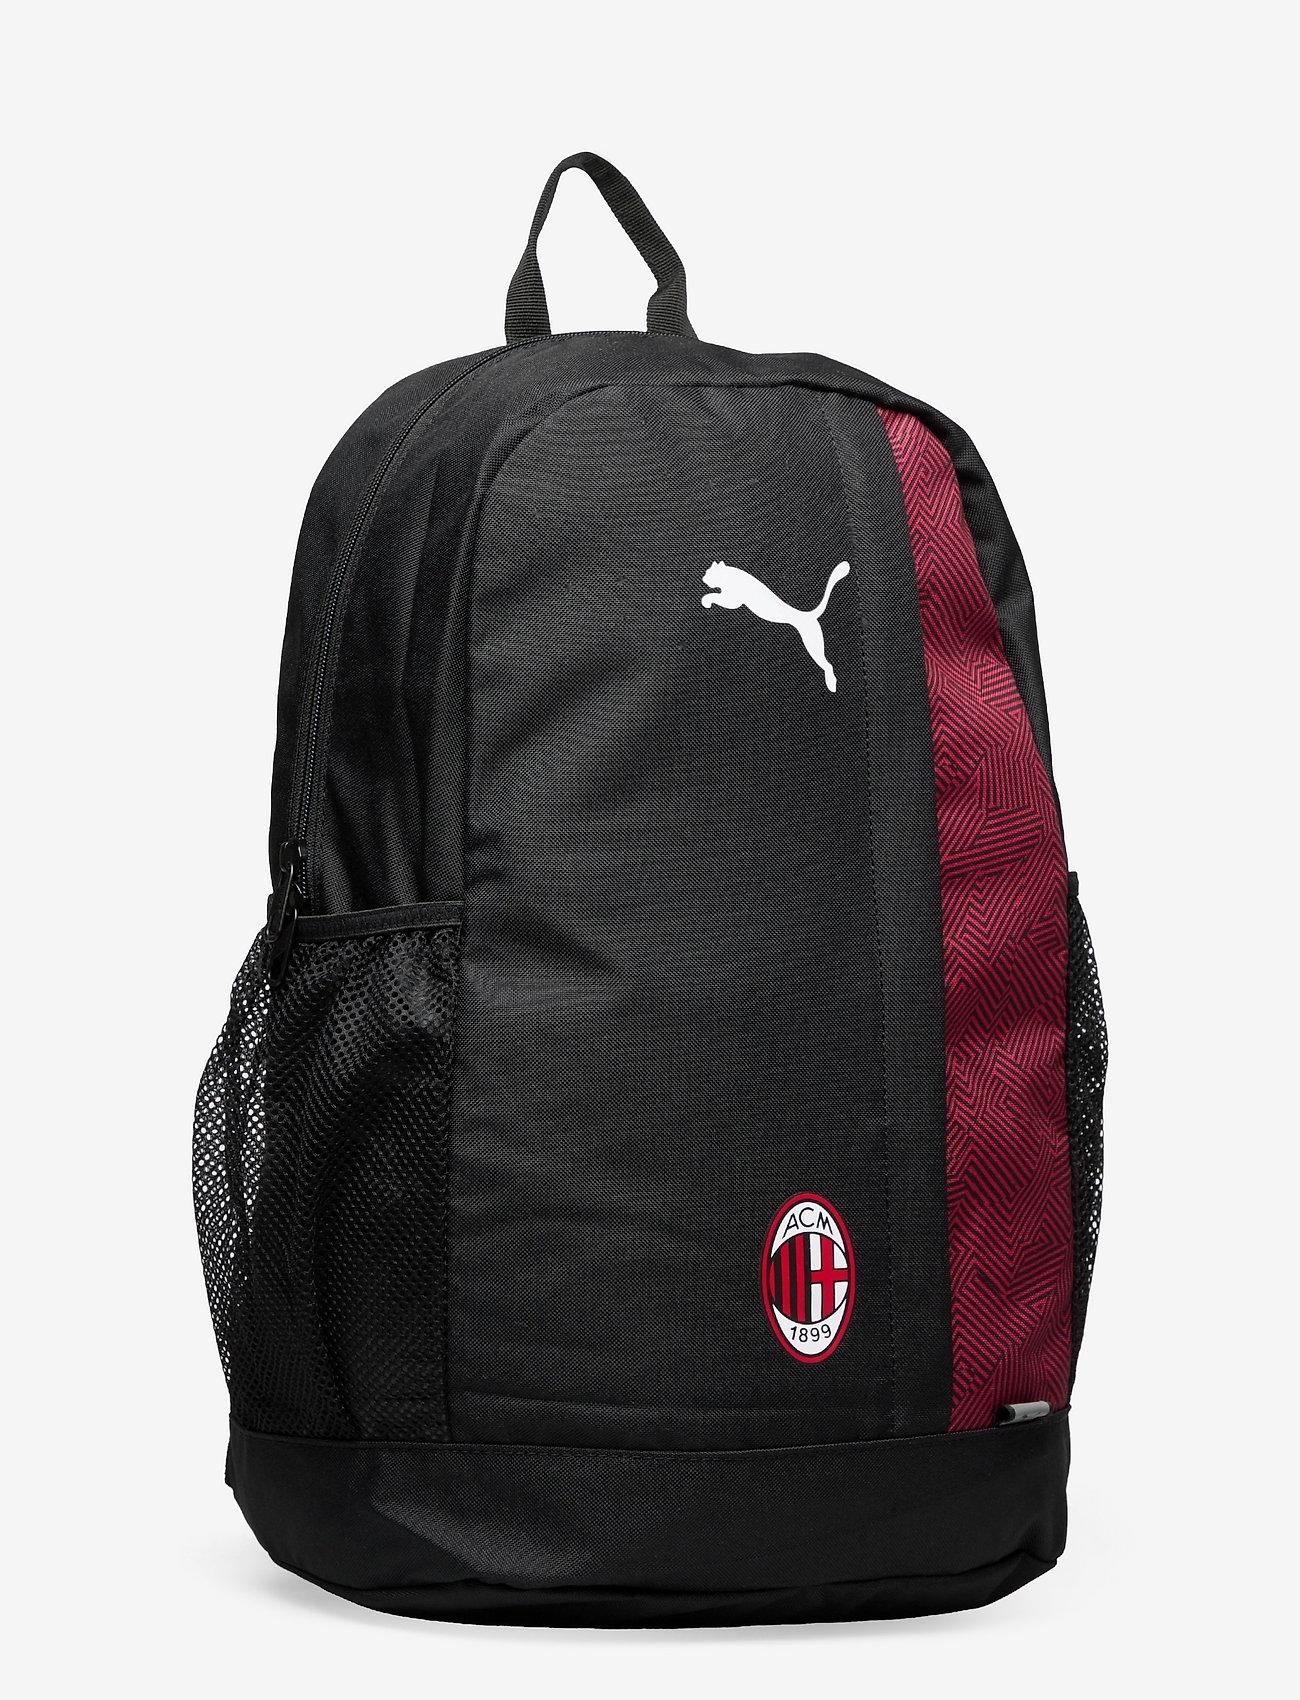 PUMA - ACM ftblCORE Backpack Plus - sale - puma black-tango red - 1